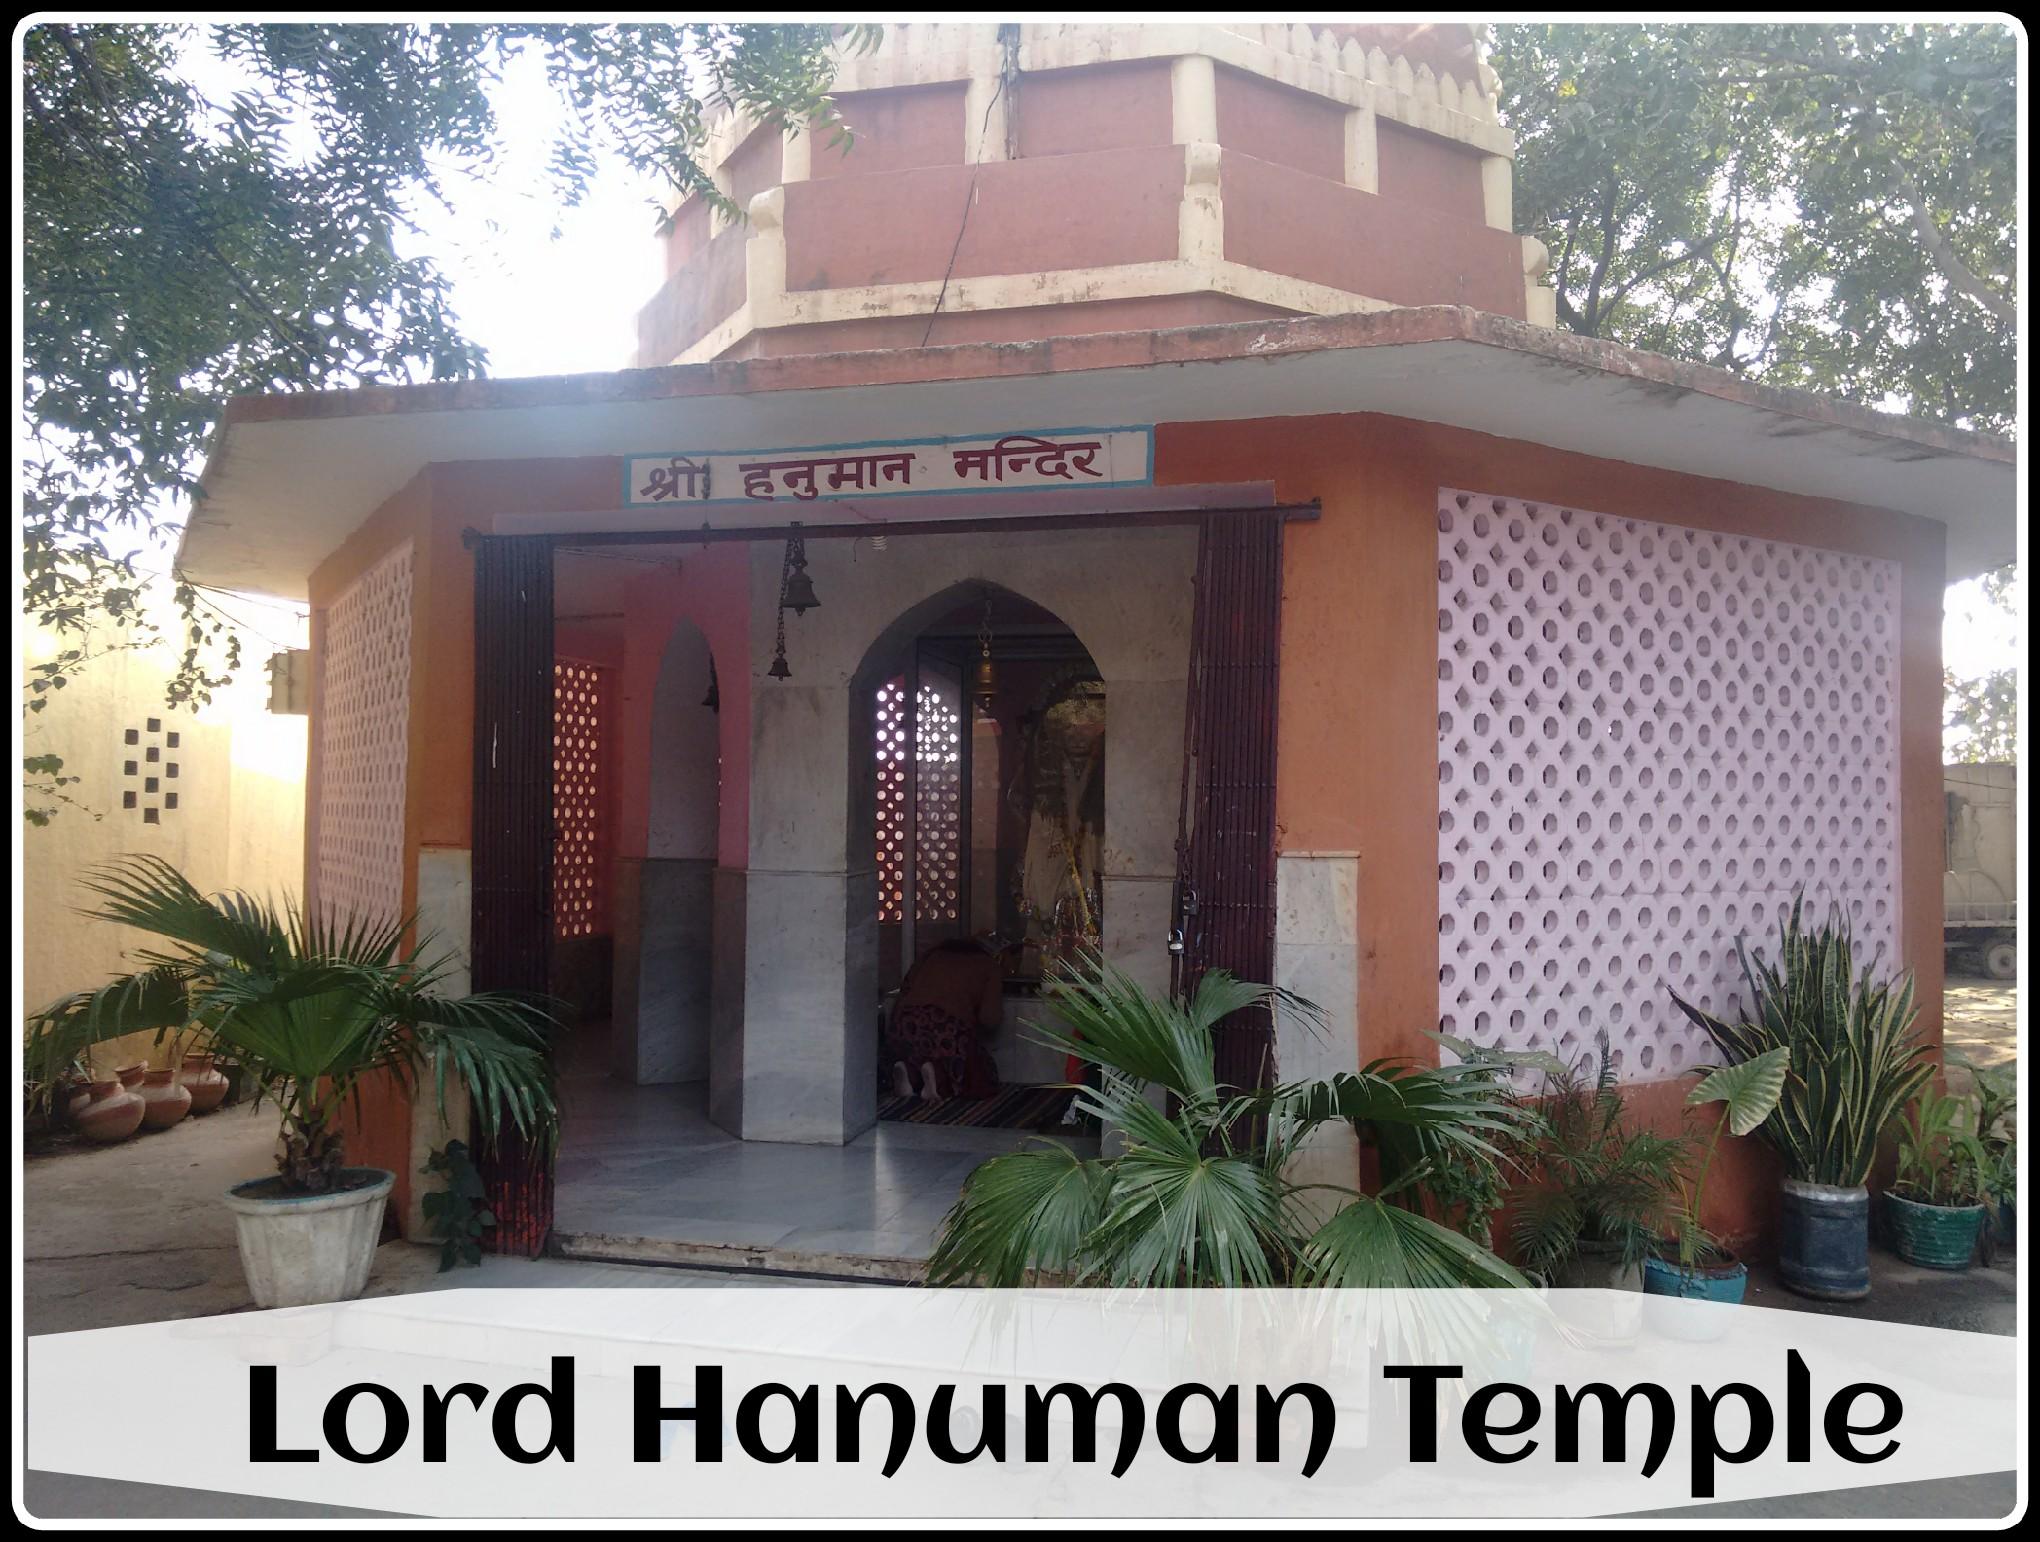 The hanuman temple